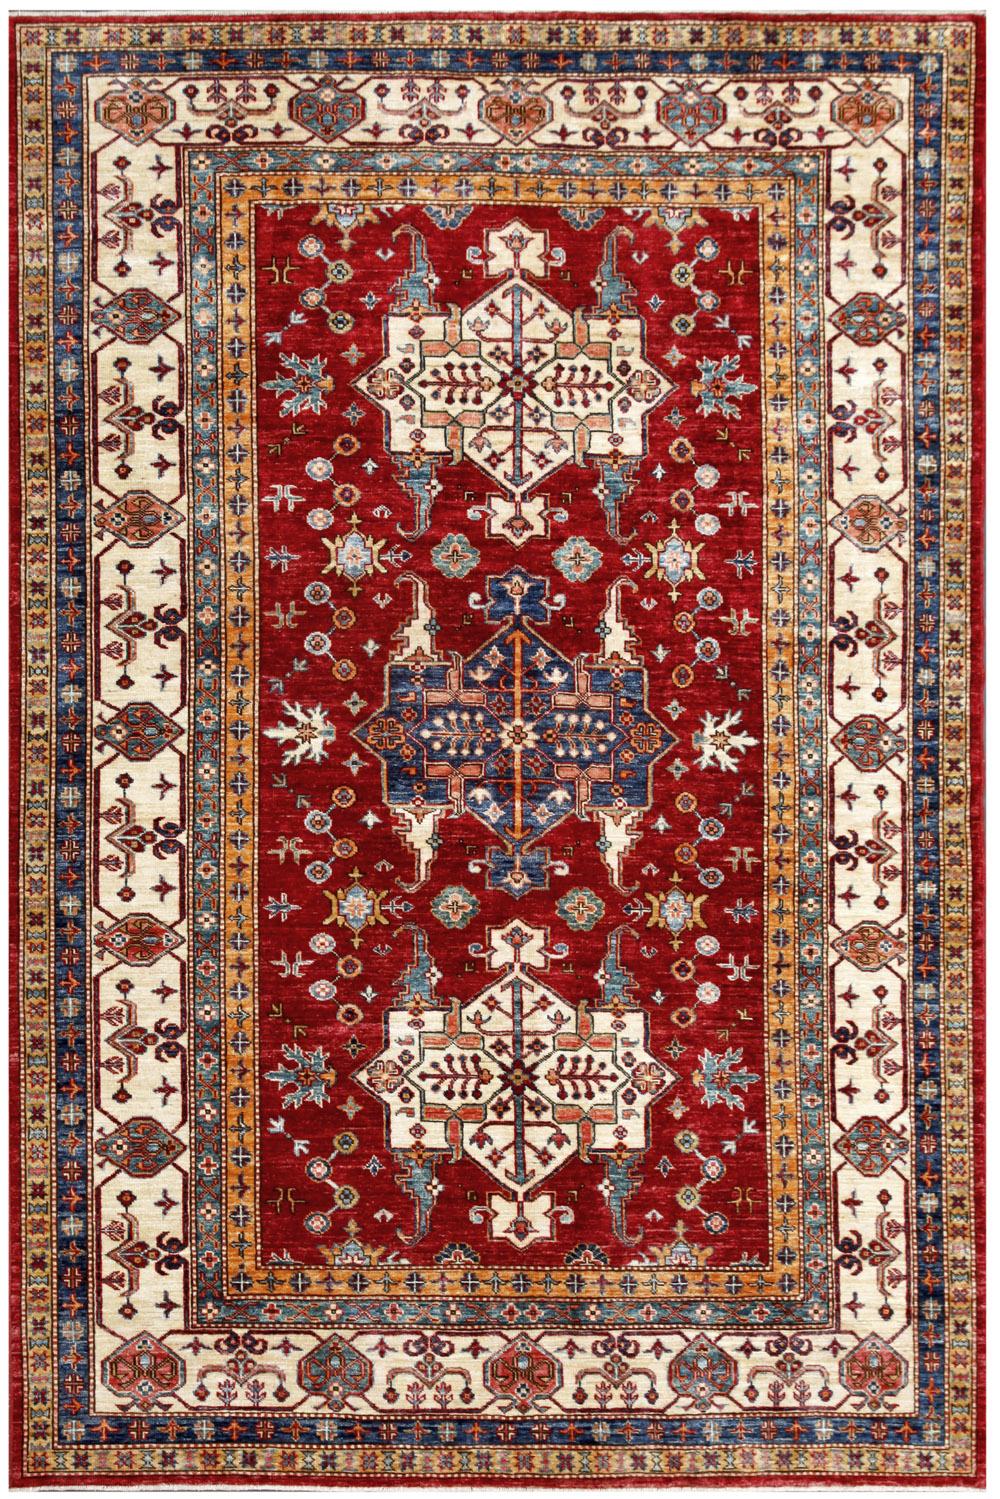 kazak 5 39 9 x 8 39 6 catalina rug. Black Bedroom Furniture Sets. Home Design Ideas